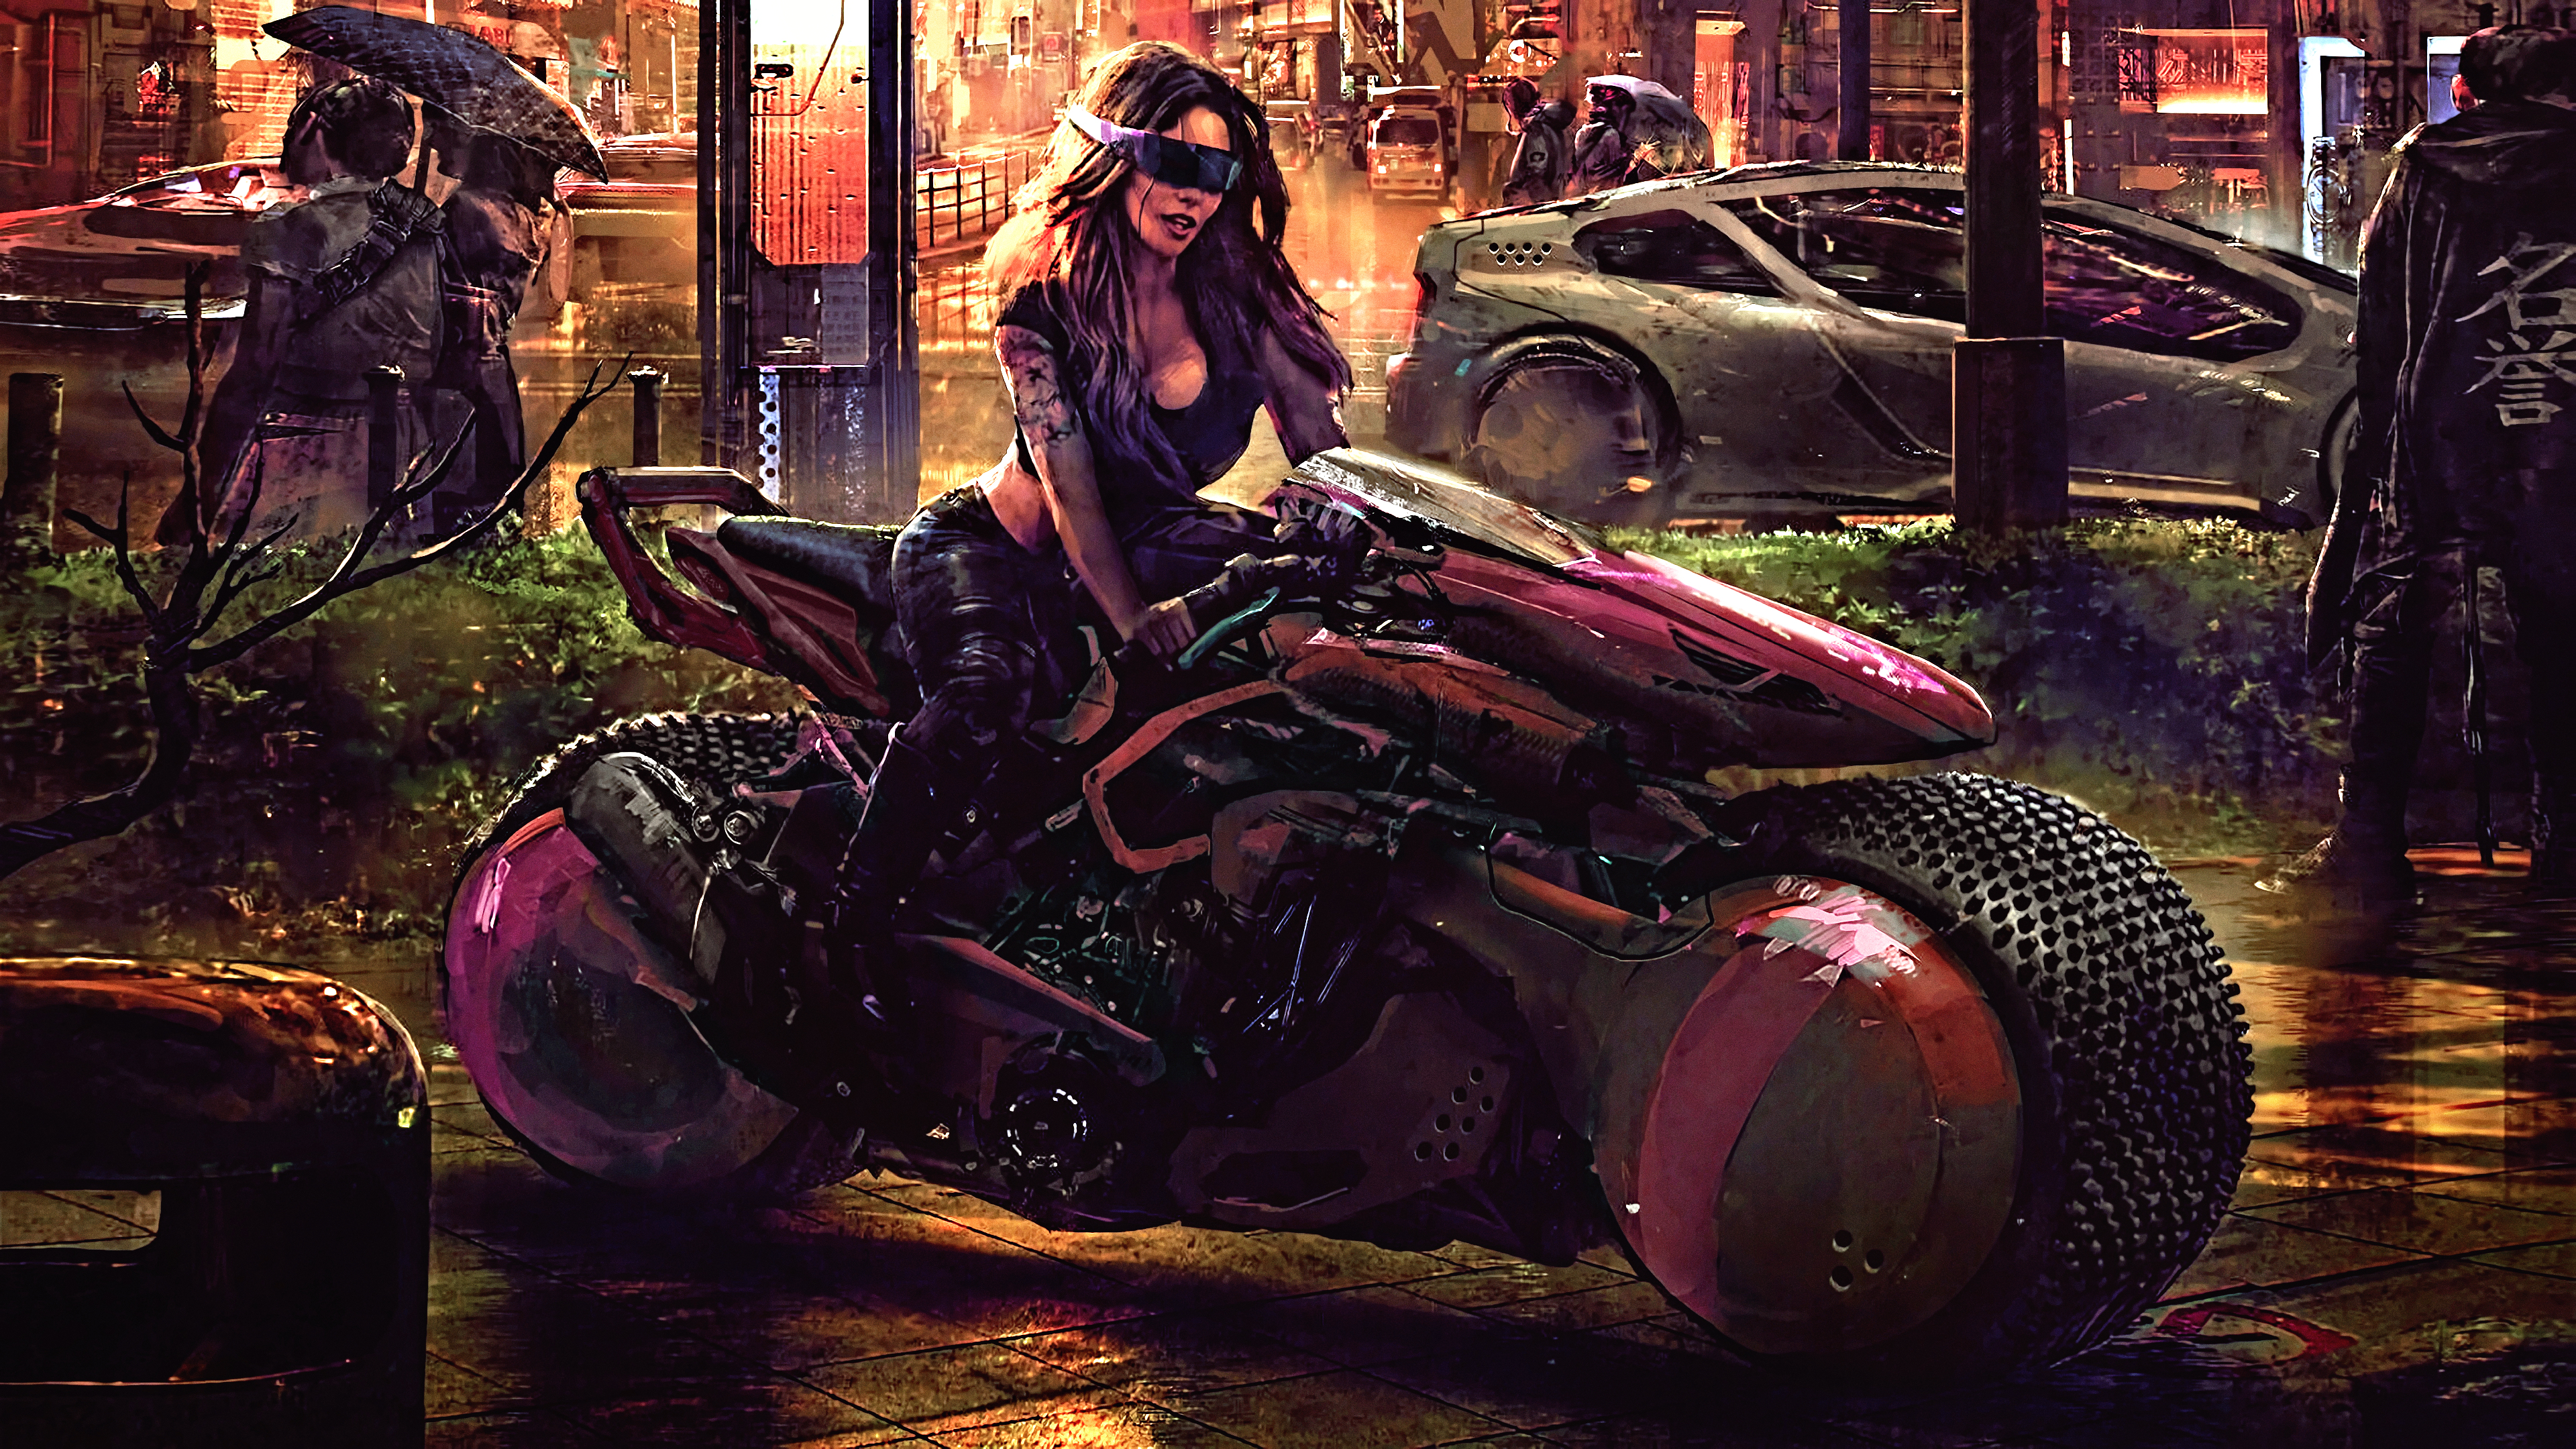 General 3840x2160 futuristic science fiction digital art concept art artwork fantasy art fan art 3D CGI cyberpunk cyber painting fantasy girl women vehicle city urban cityscape futuristic city closeup realistic Eddie Mendoza car motorcycle